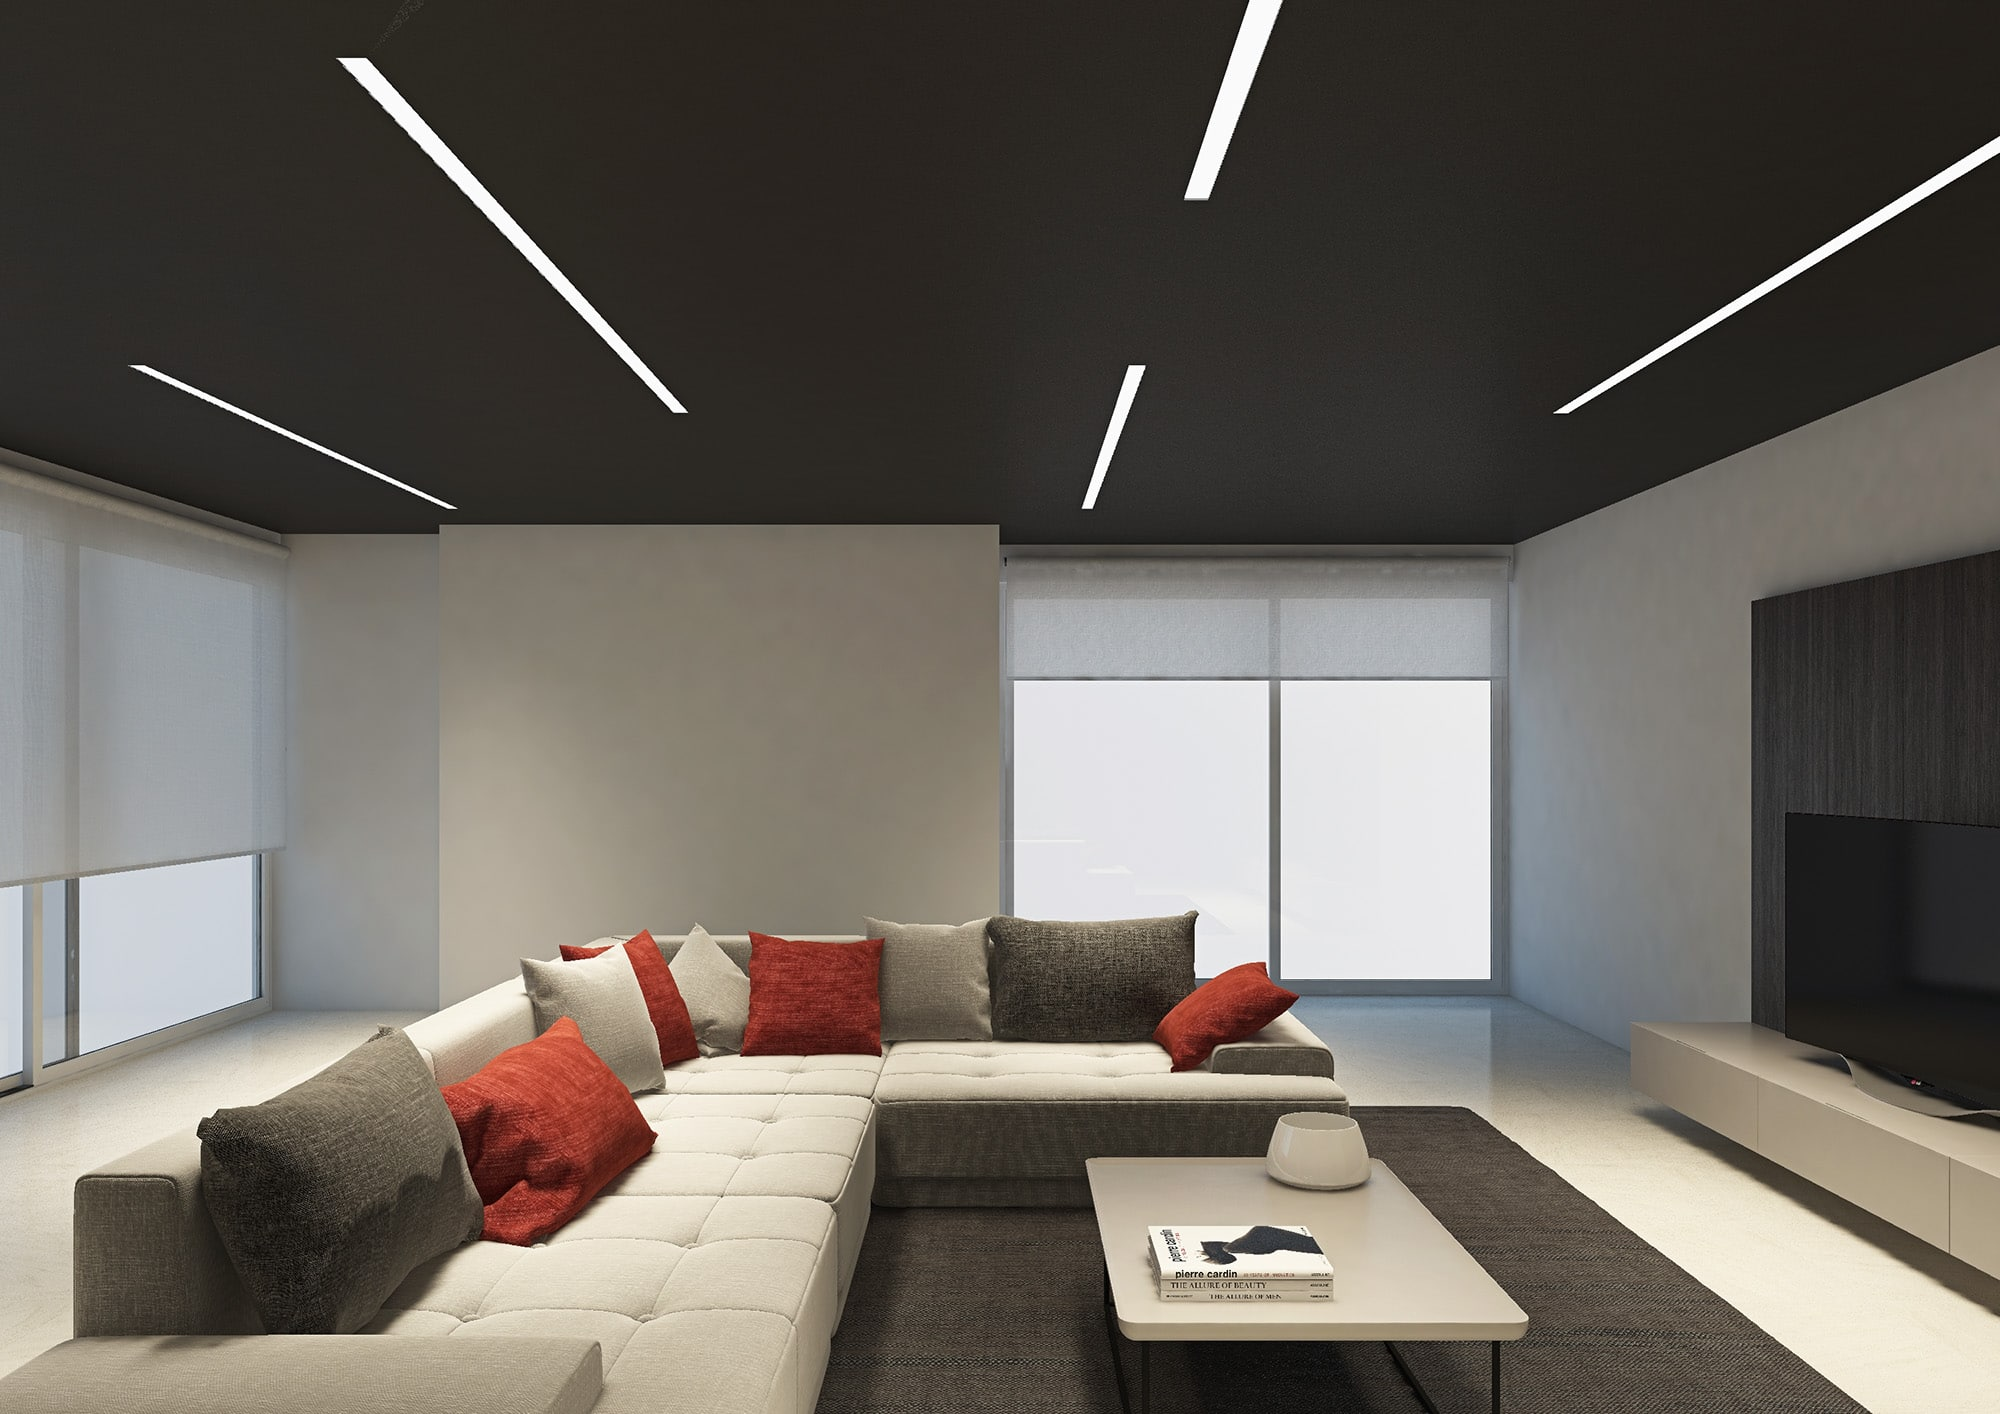 proyecto iluminacion